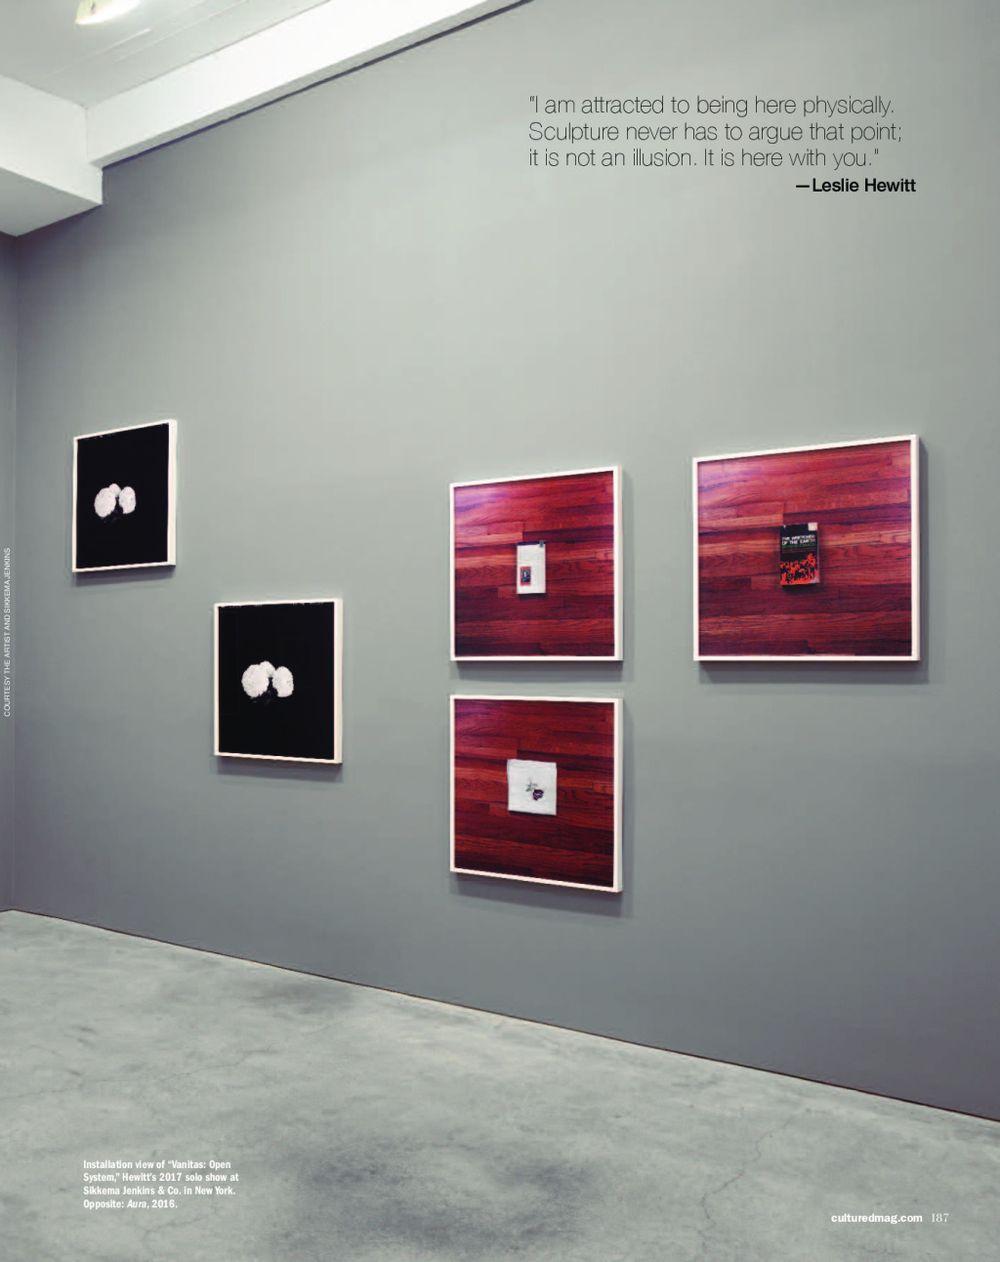 Cultured | Leslie HEWITT